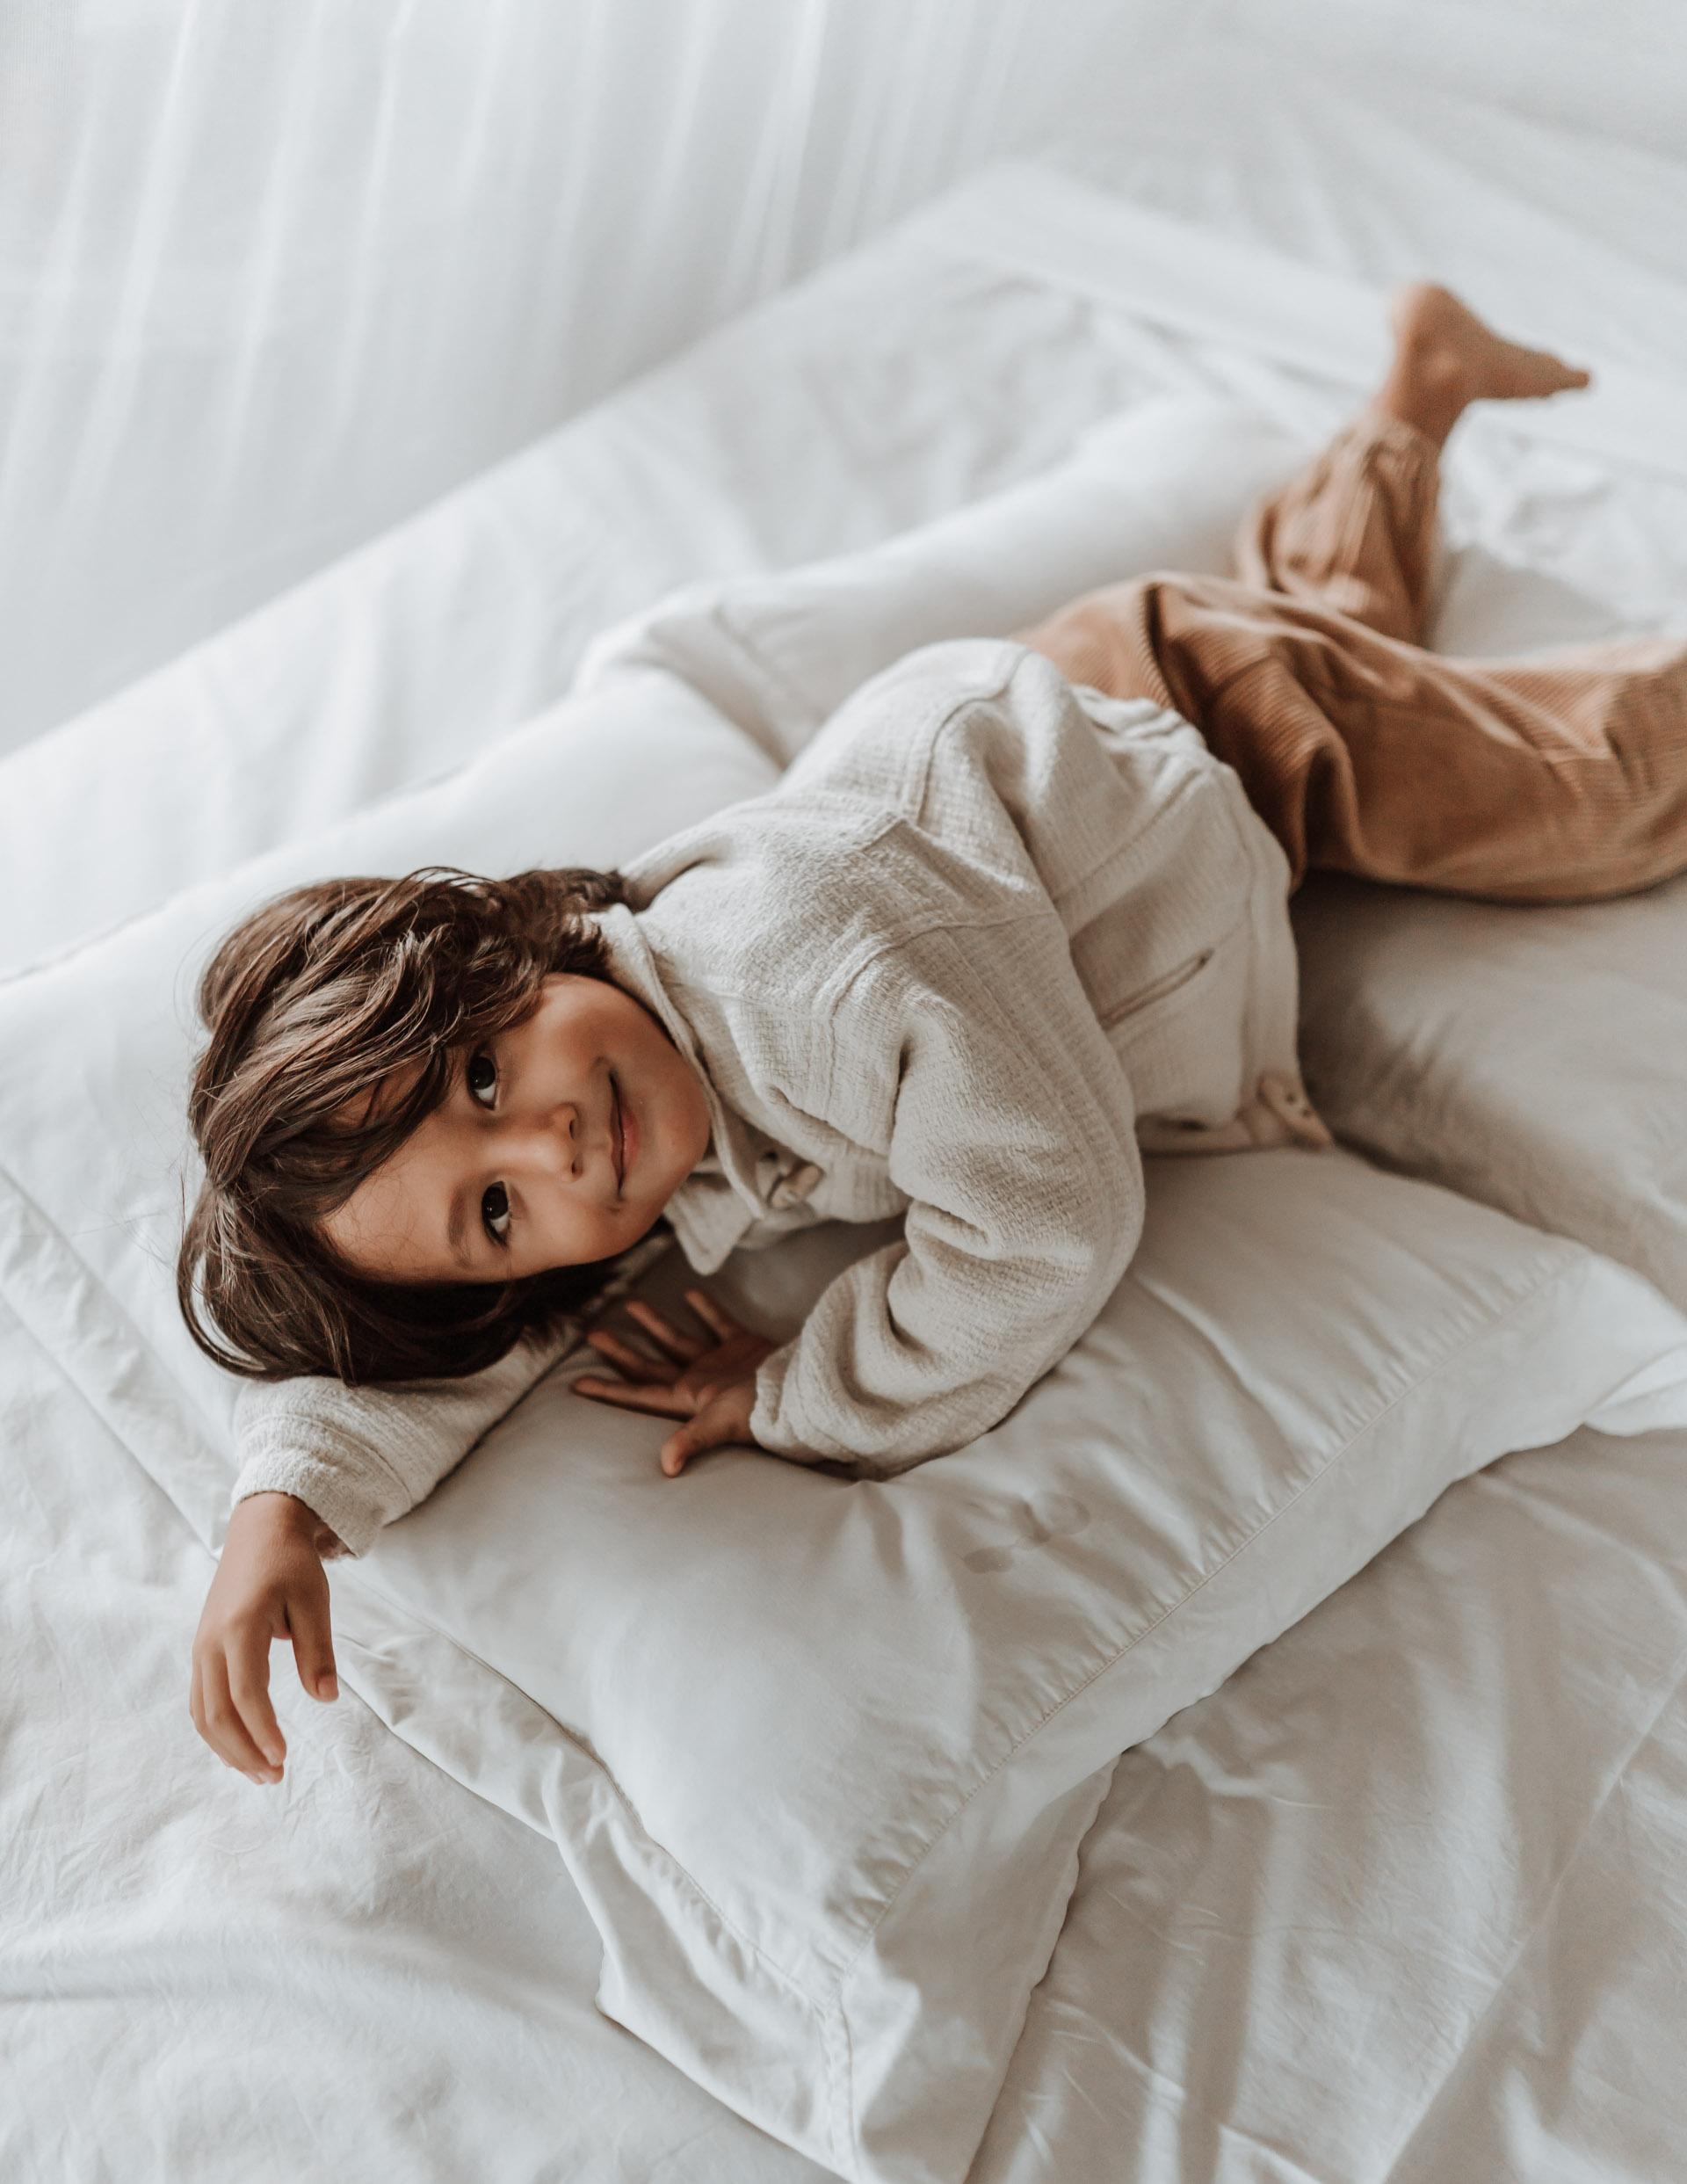 keira-mason-illoura-the-label-boy-in-jacket-on-bed.jpg